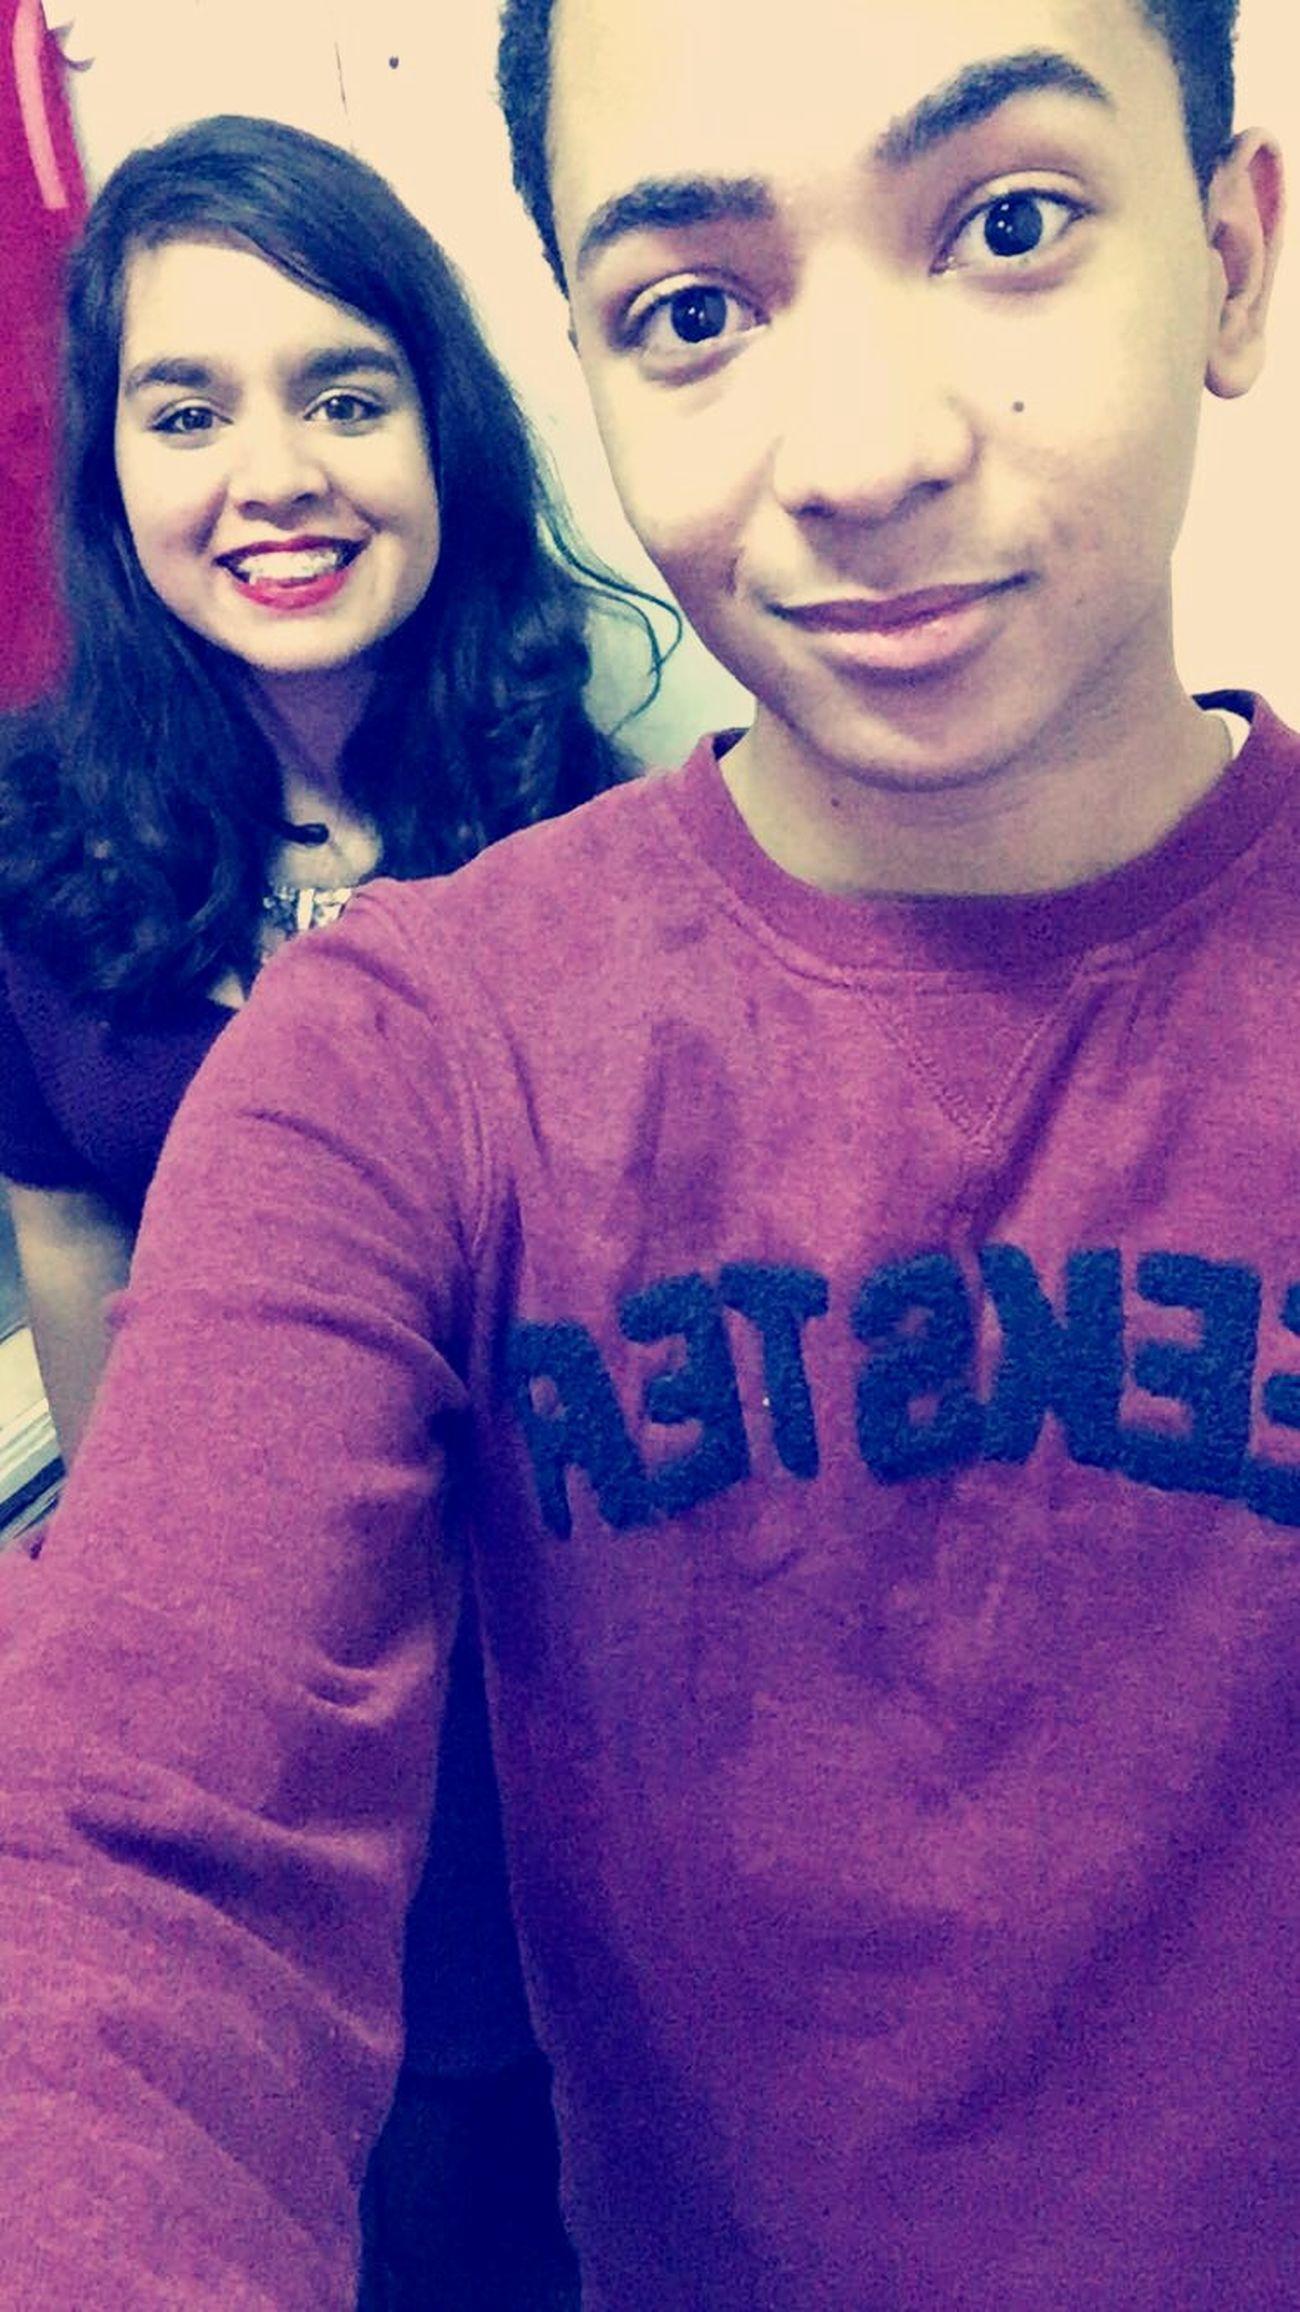 Selfie Friend ☺❤